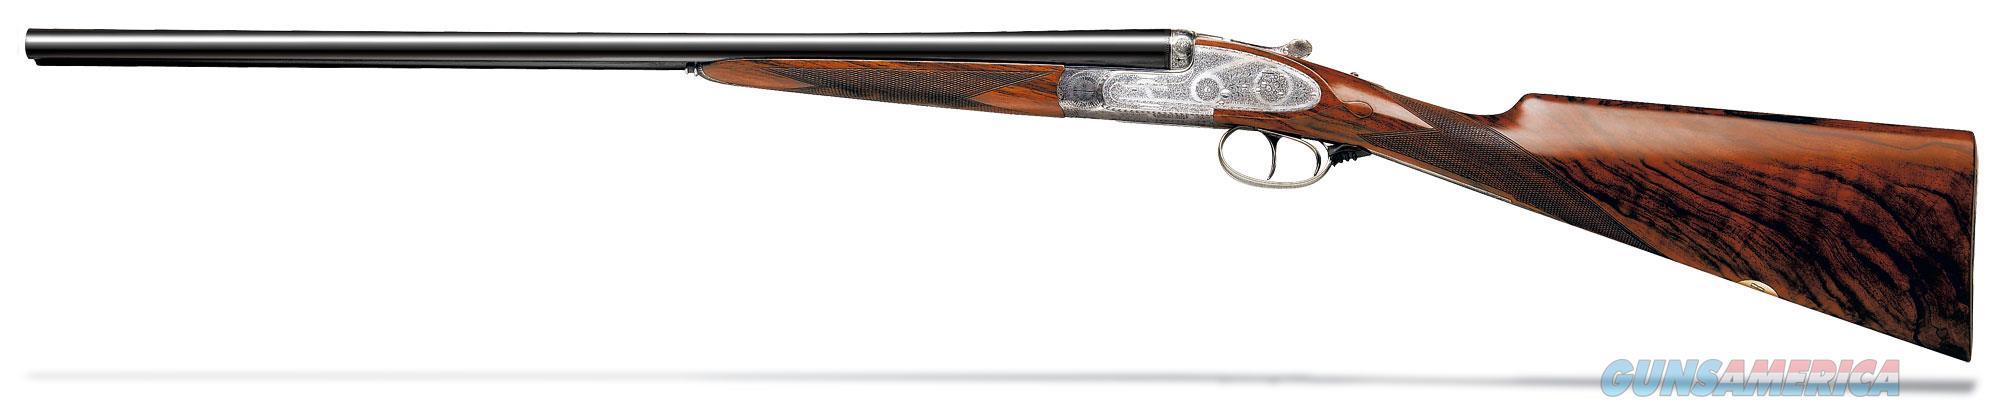 "Grulla Royal 20GA 28"" bbl H&H Engraved  Guns > Shotguns > Grulla Shotguns"